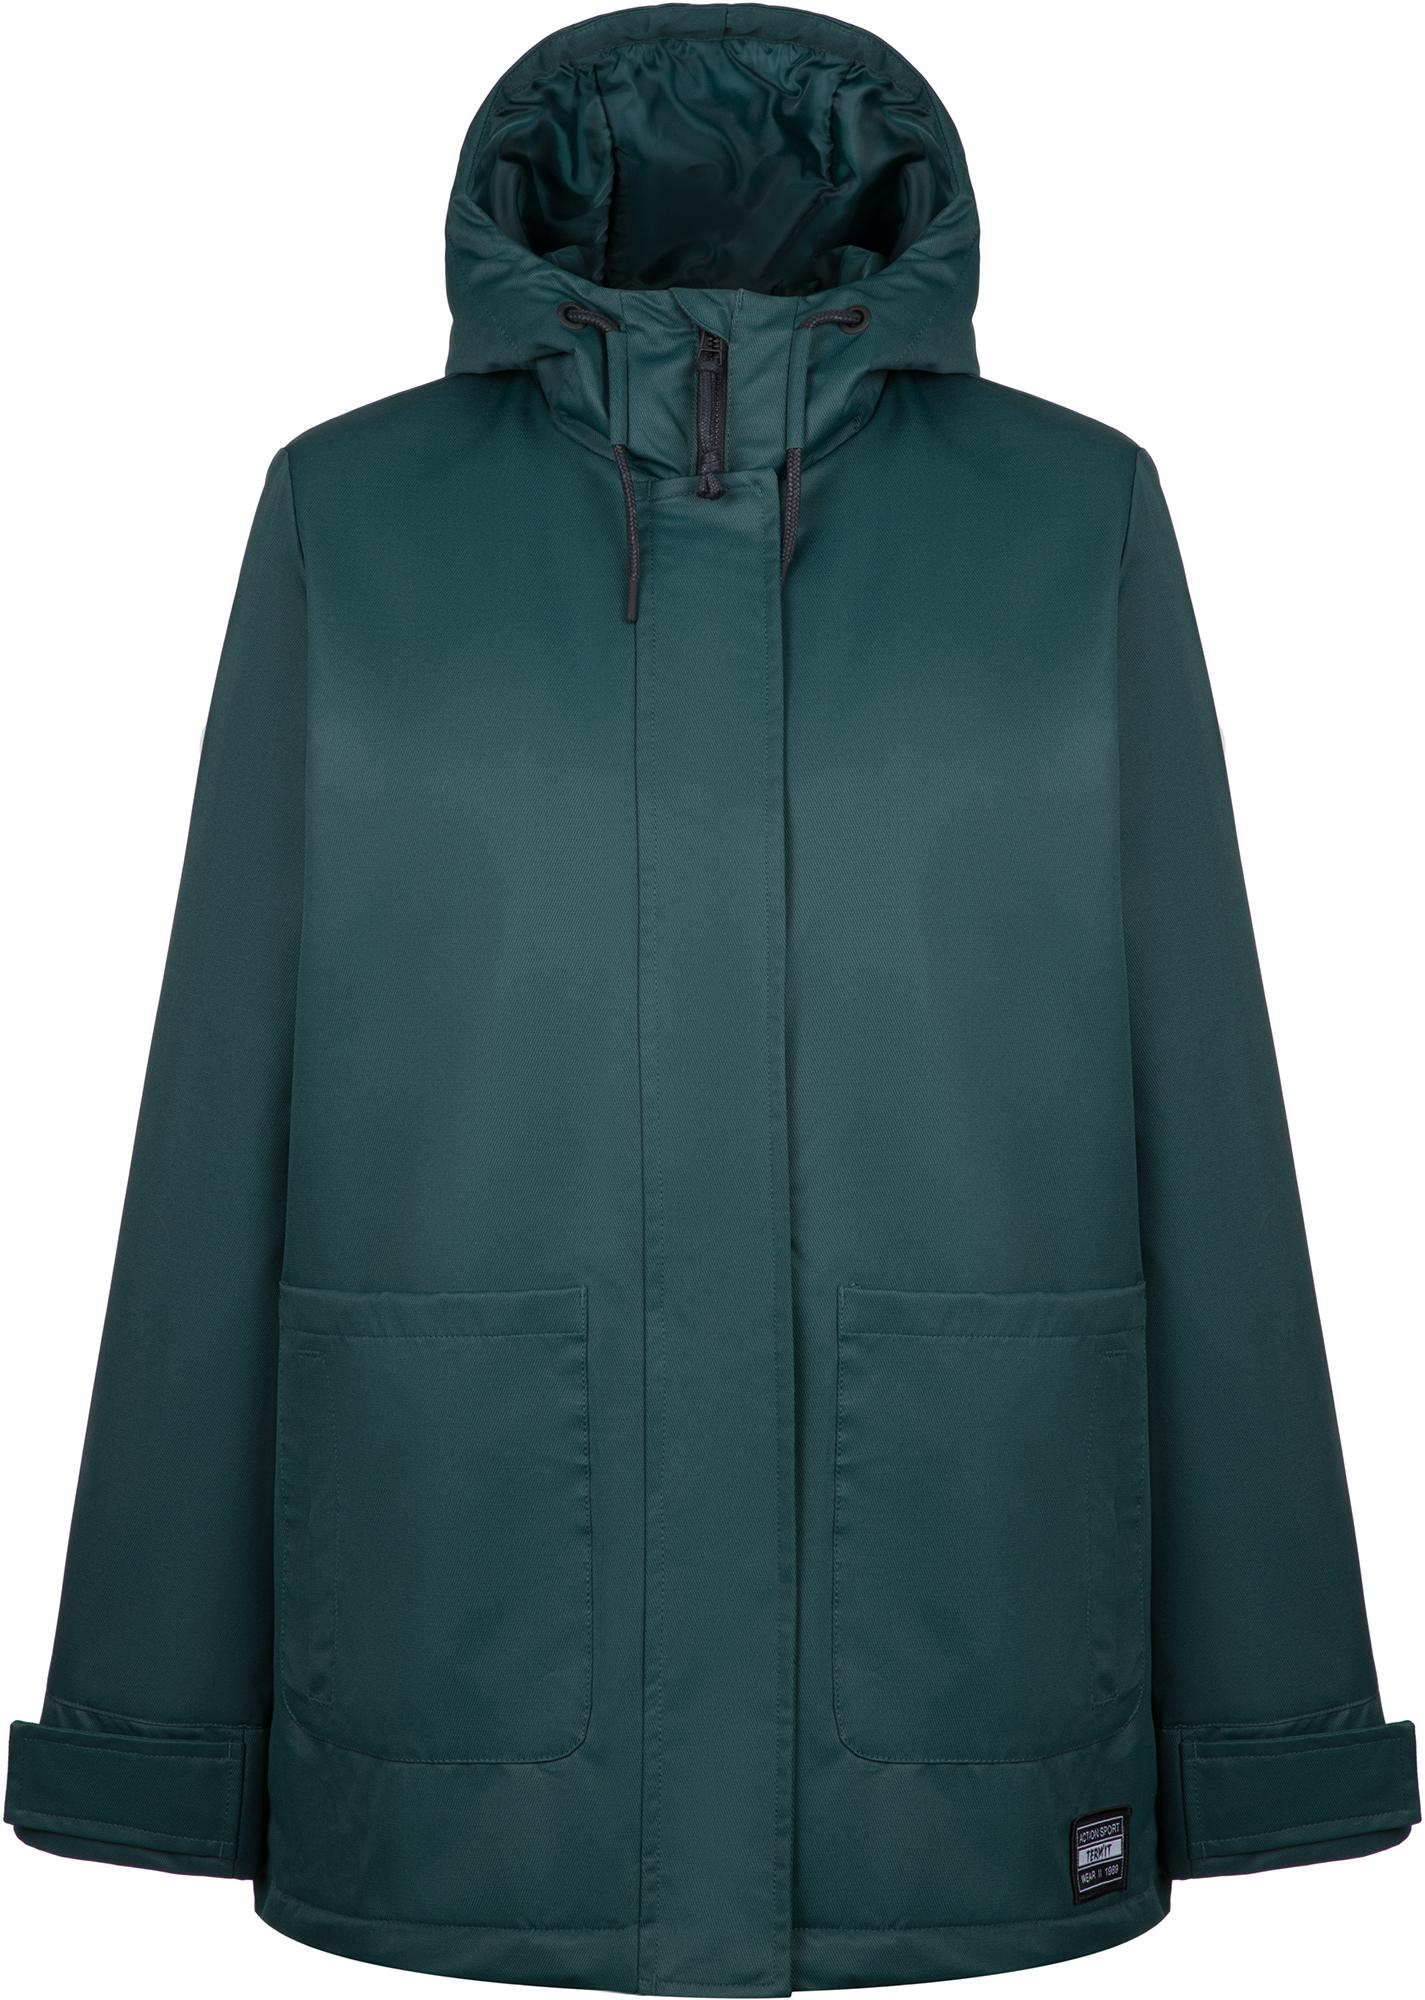 Termit Куртка утепленная женская Termit, размер 42